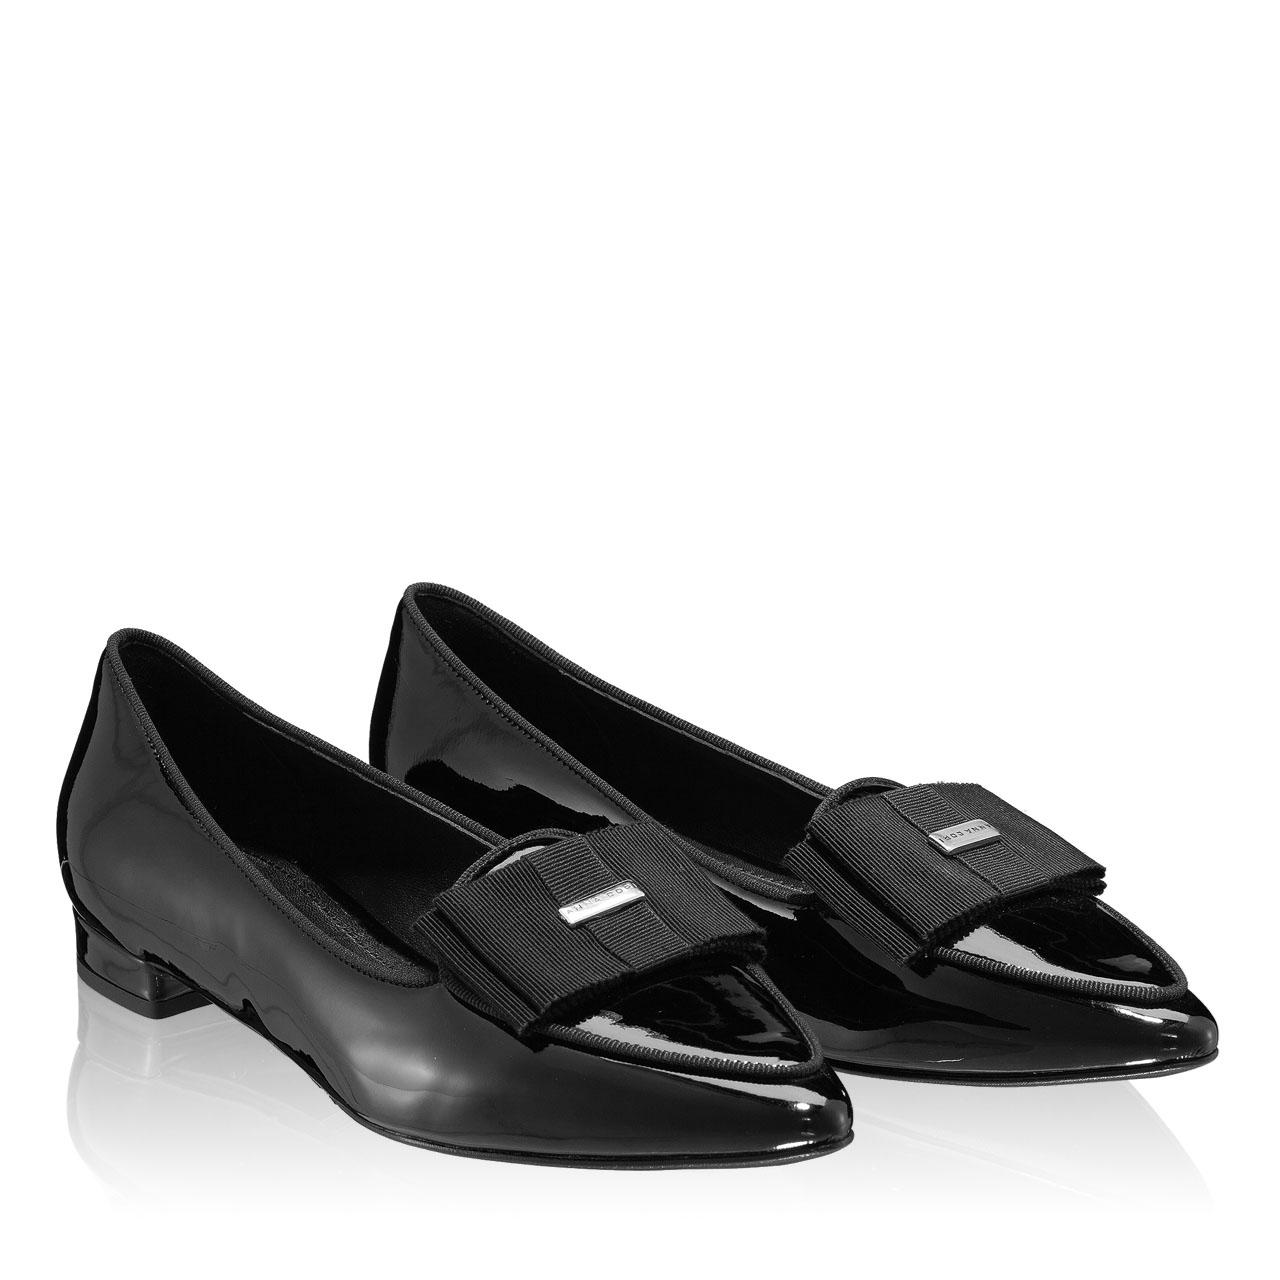 Imagine Pantofi Casual Dama 5877 Vernice Nero